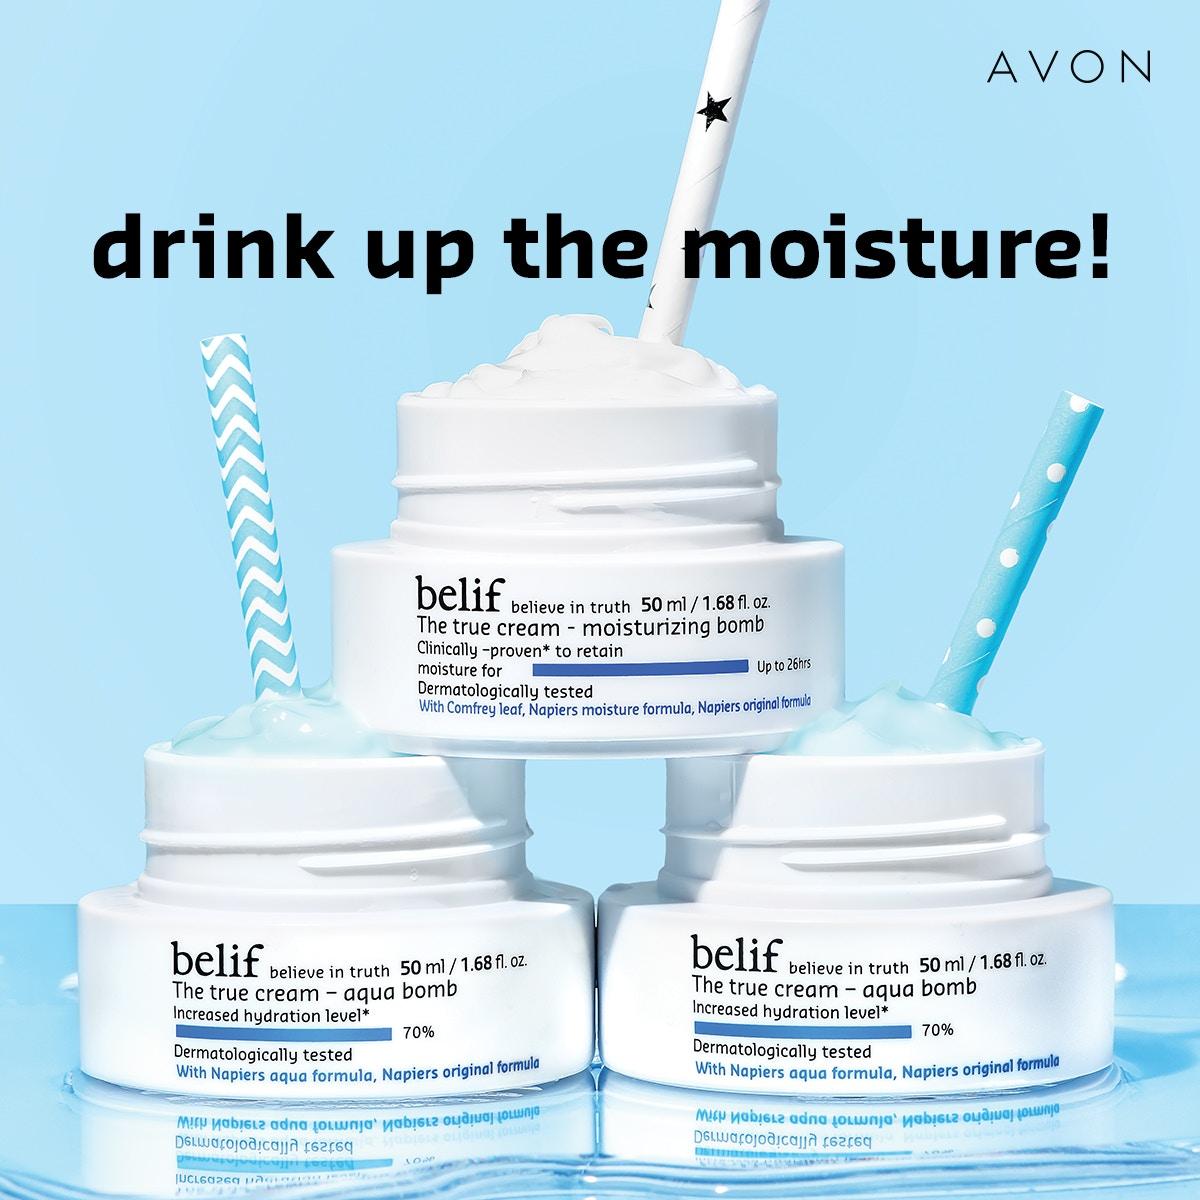 Believe in belif! http://go.youravon.com/3n58gp #AntiAging #skincare #skincareproducts #BeautifulWomenpic.twitter.com/rLOVK4iUMc